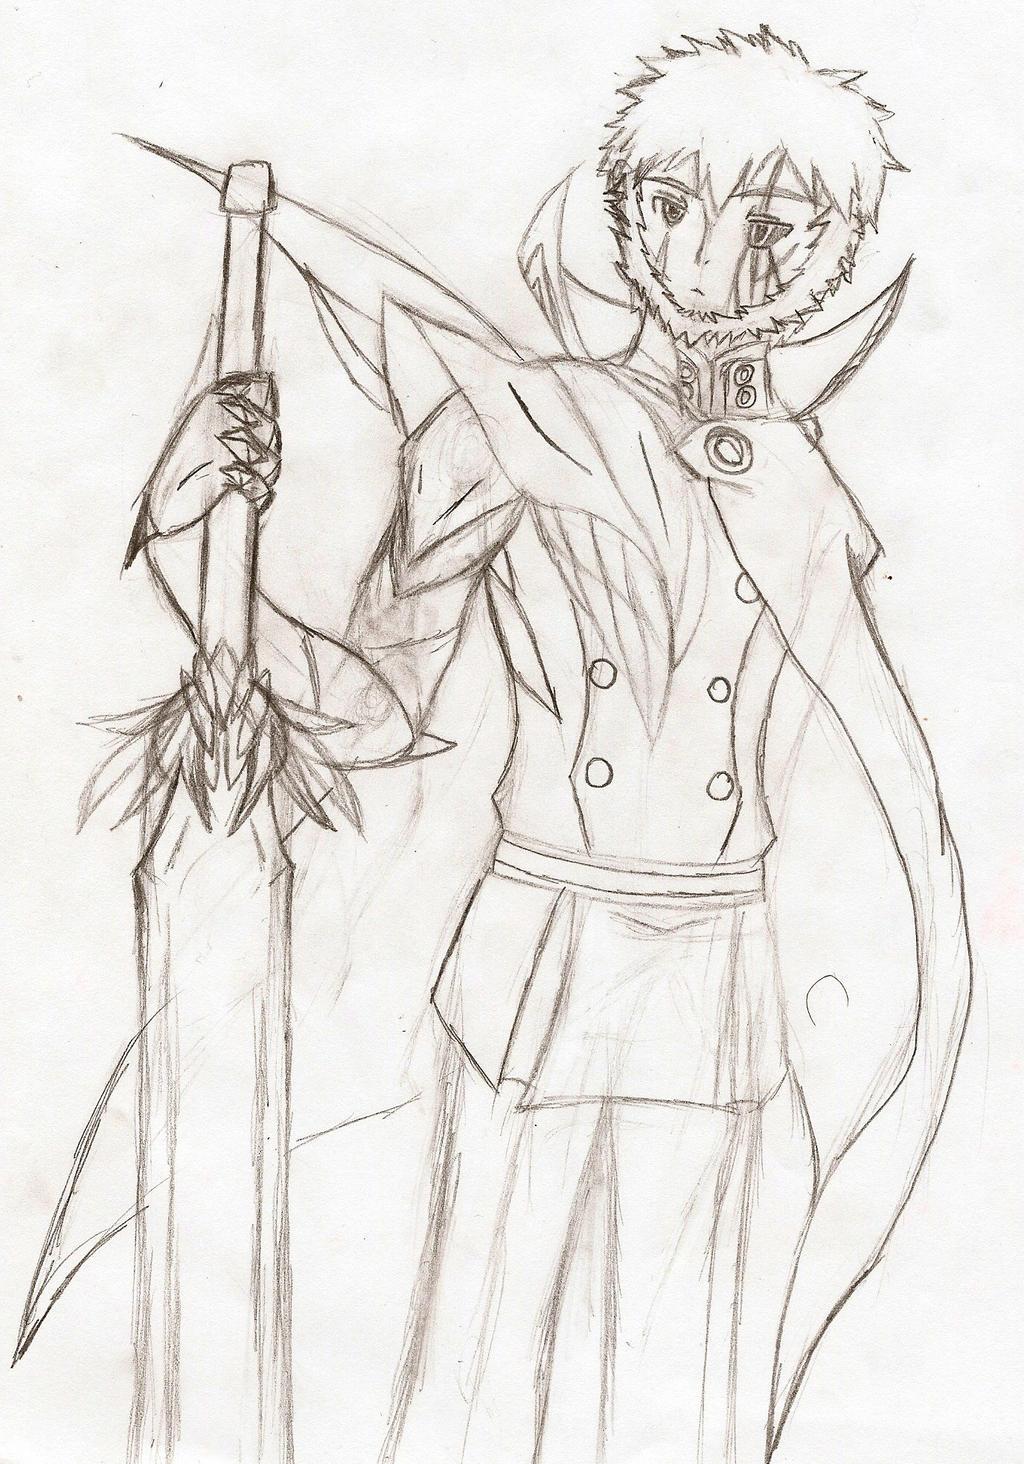 Owari no Seraph OC: Revelation of the Gentle Demon by NeonNeoz